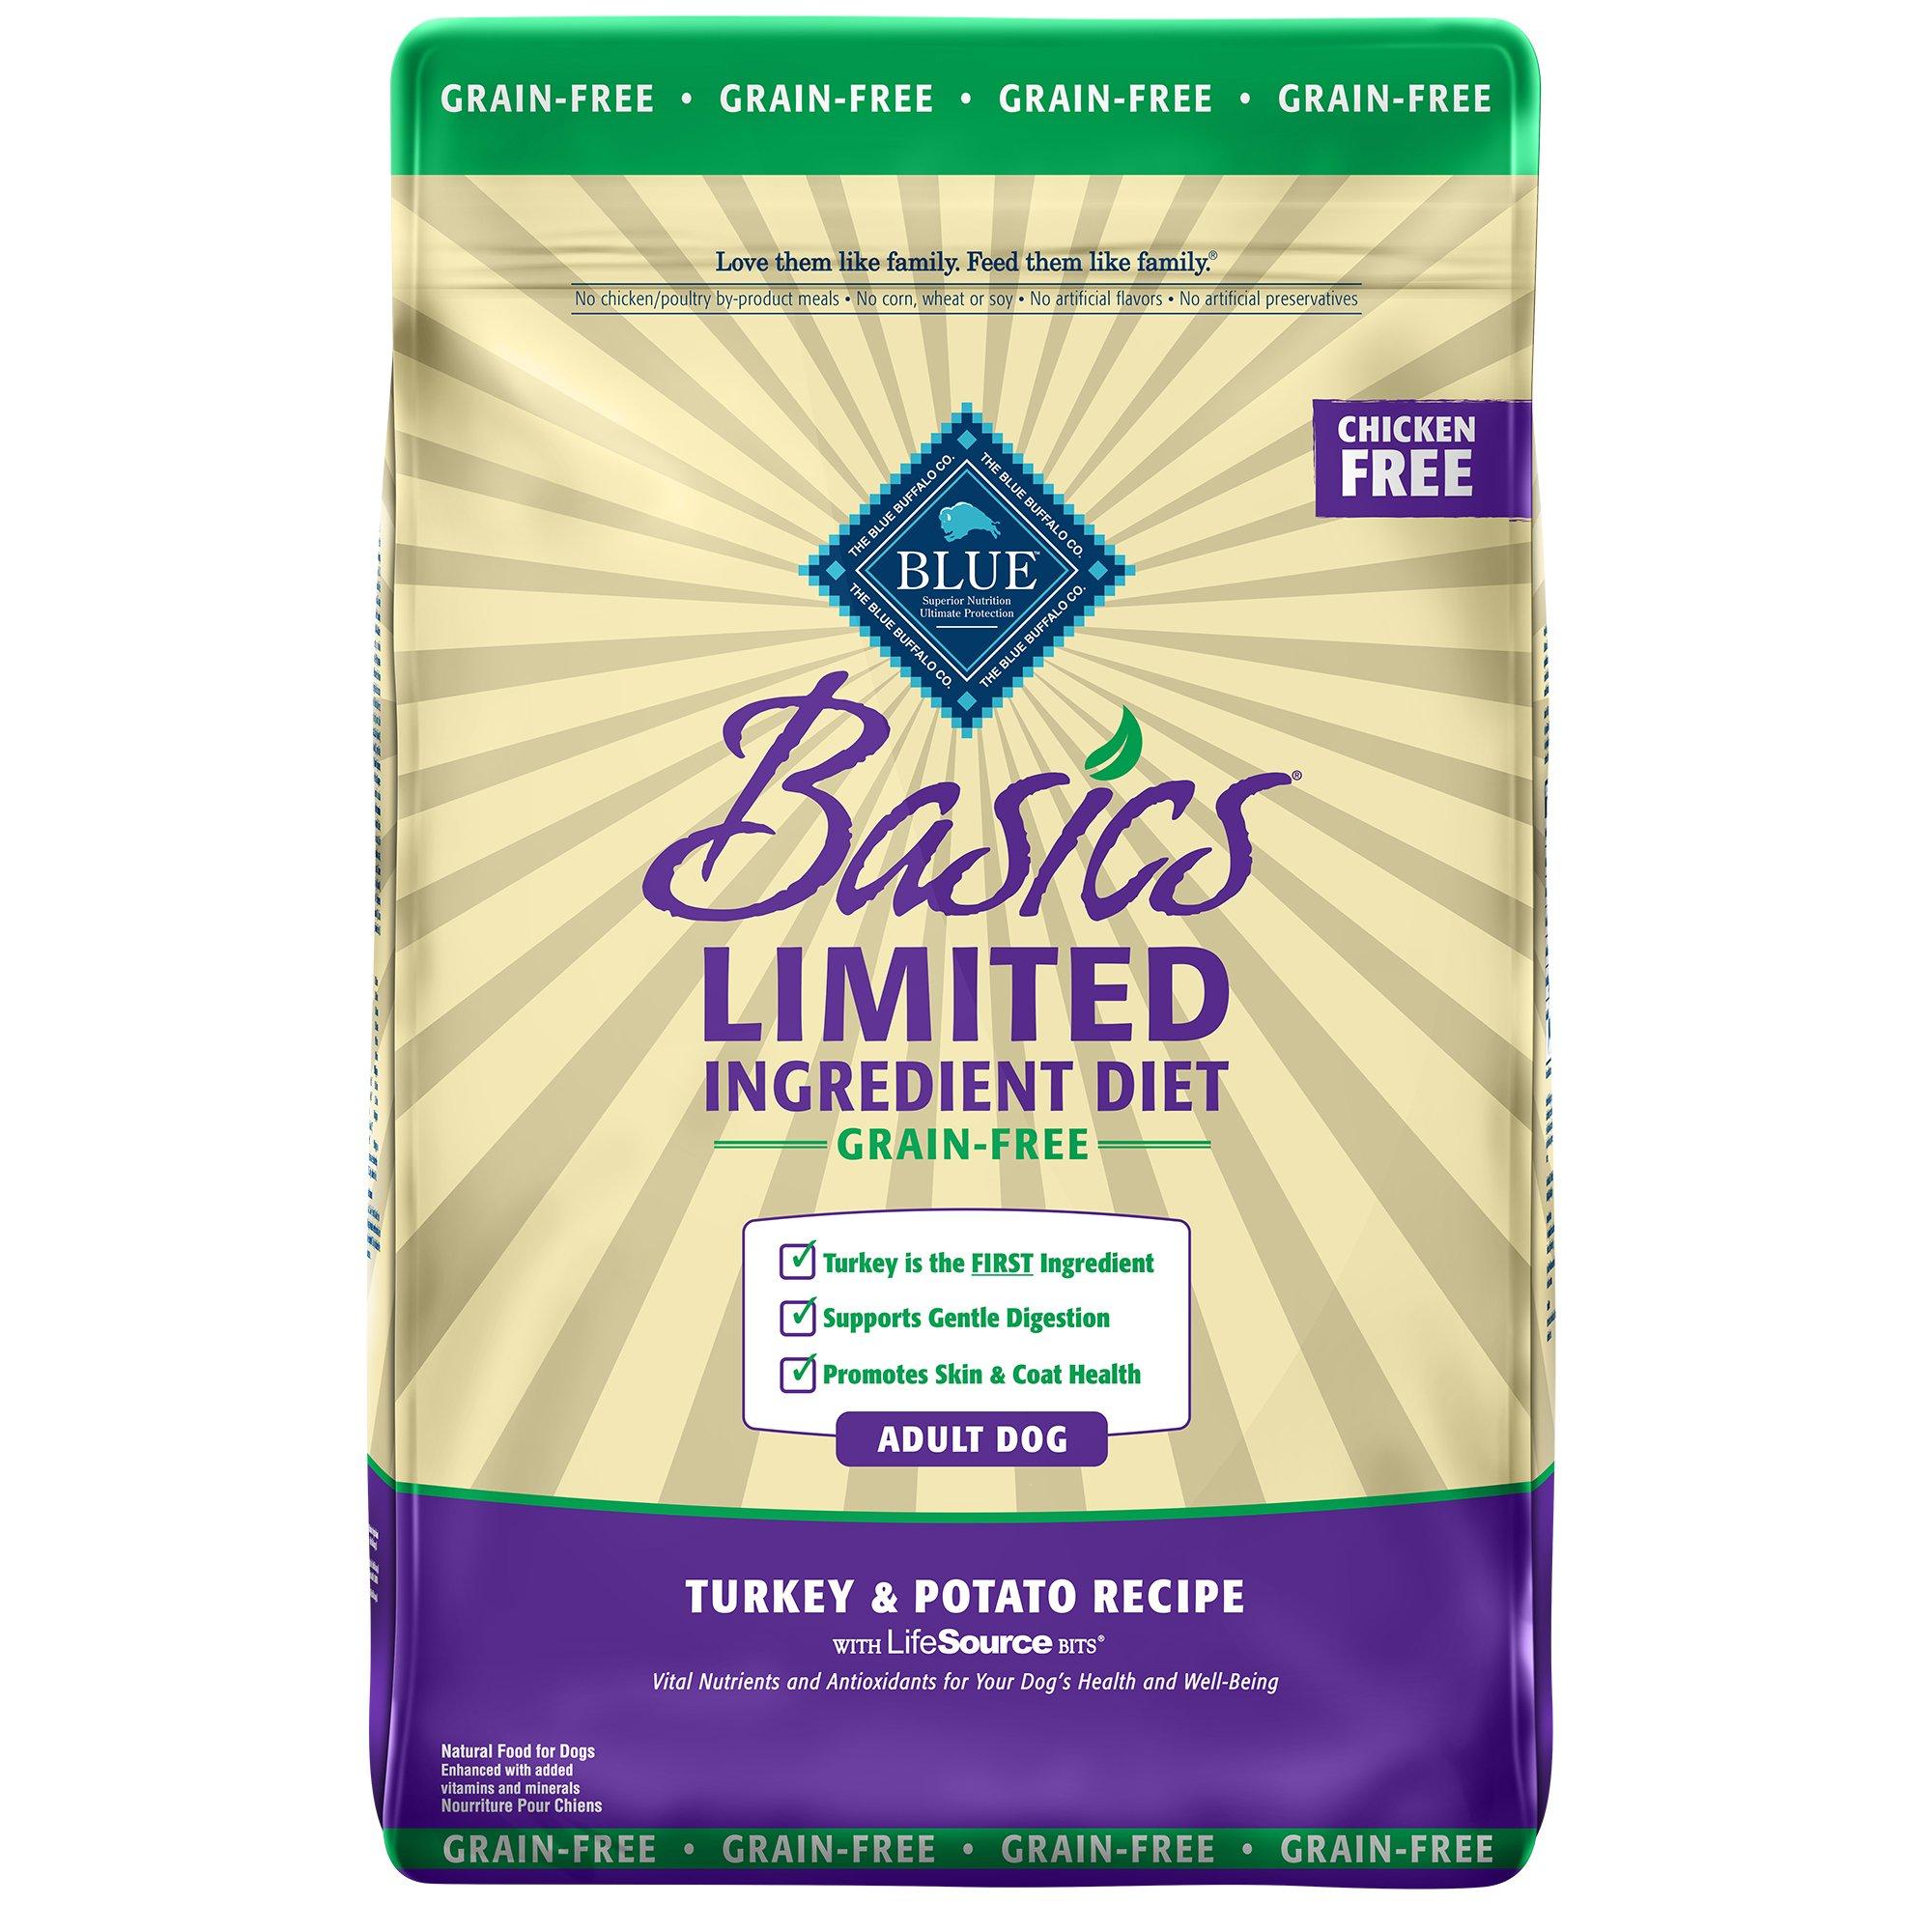 Blue Buffalo Basics Limited Ingredient Grain Free Turkey & Potato Dog Food